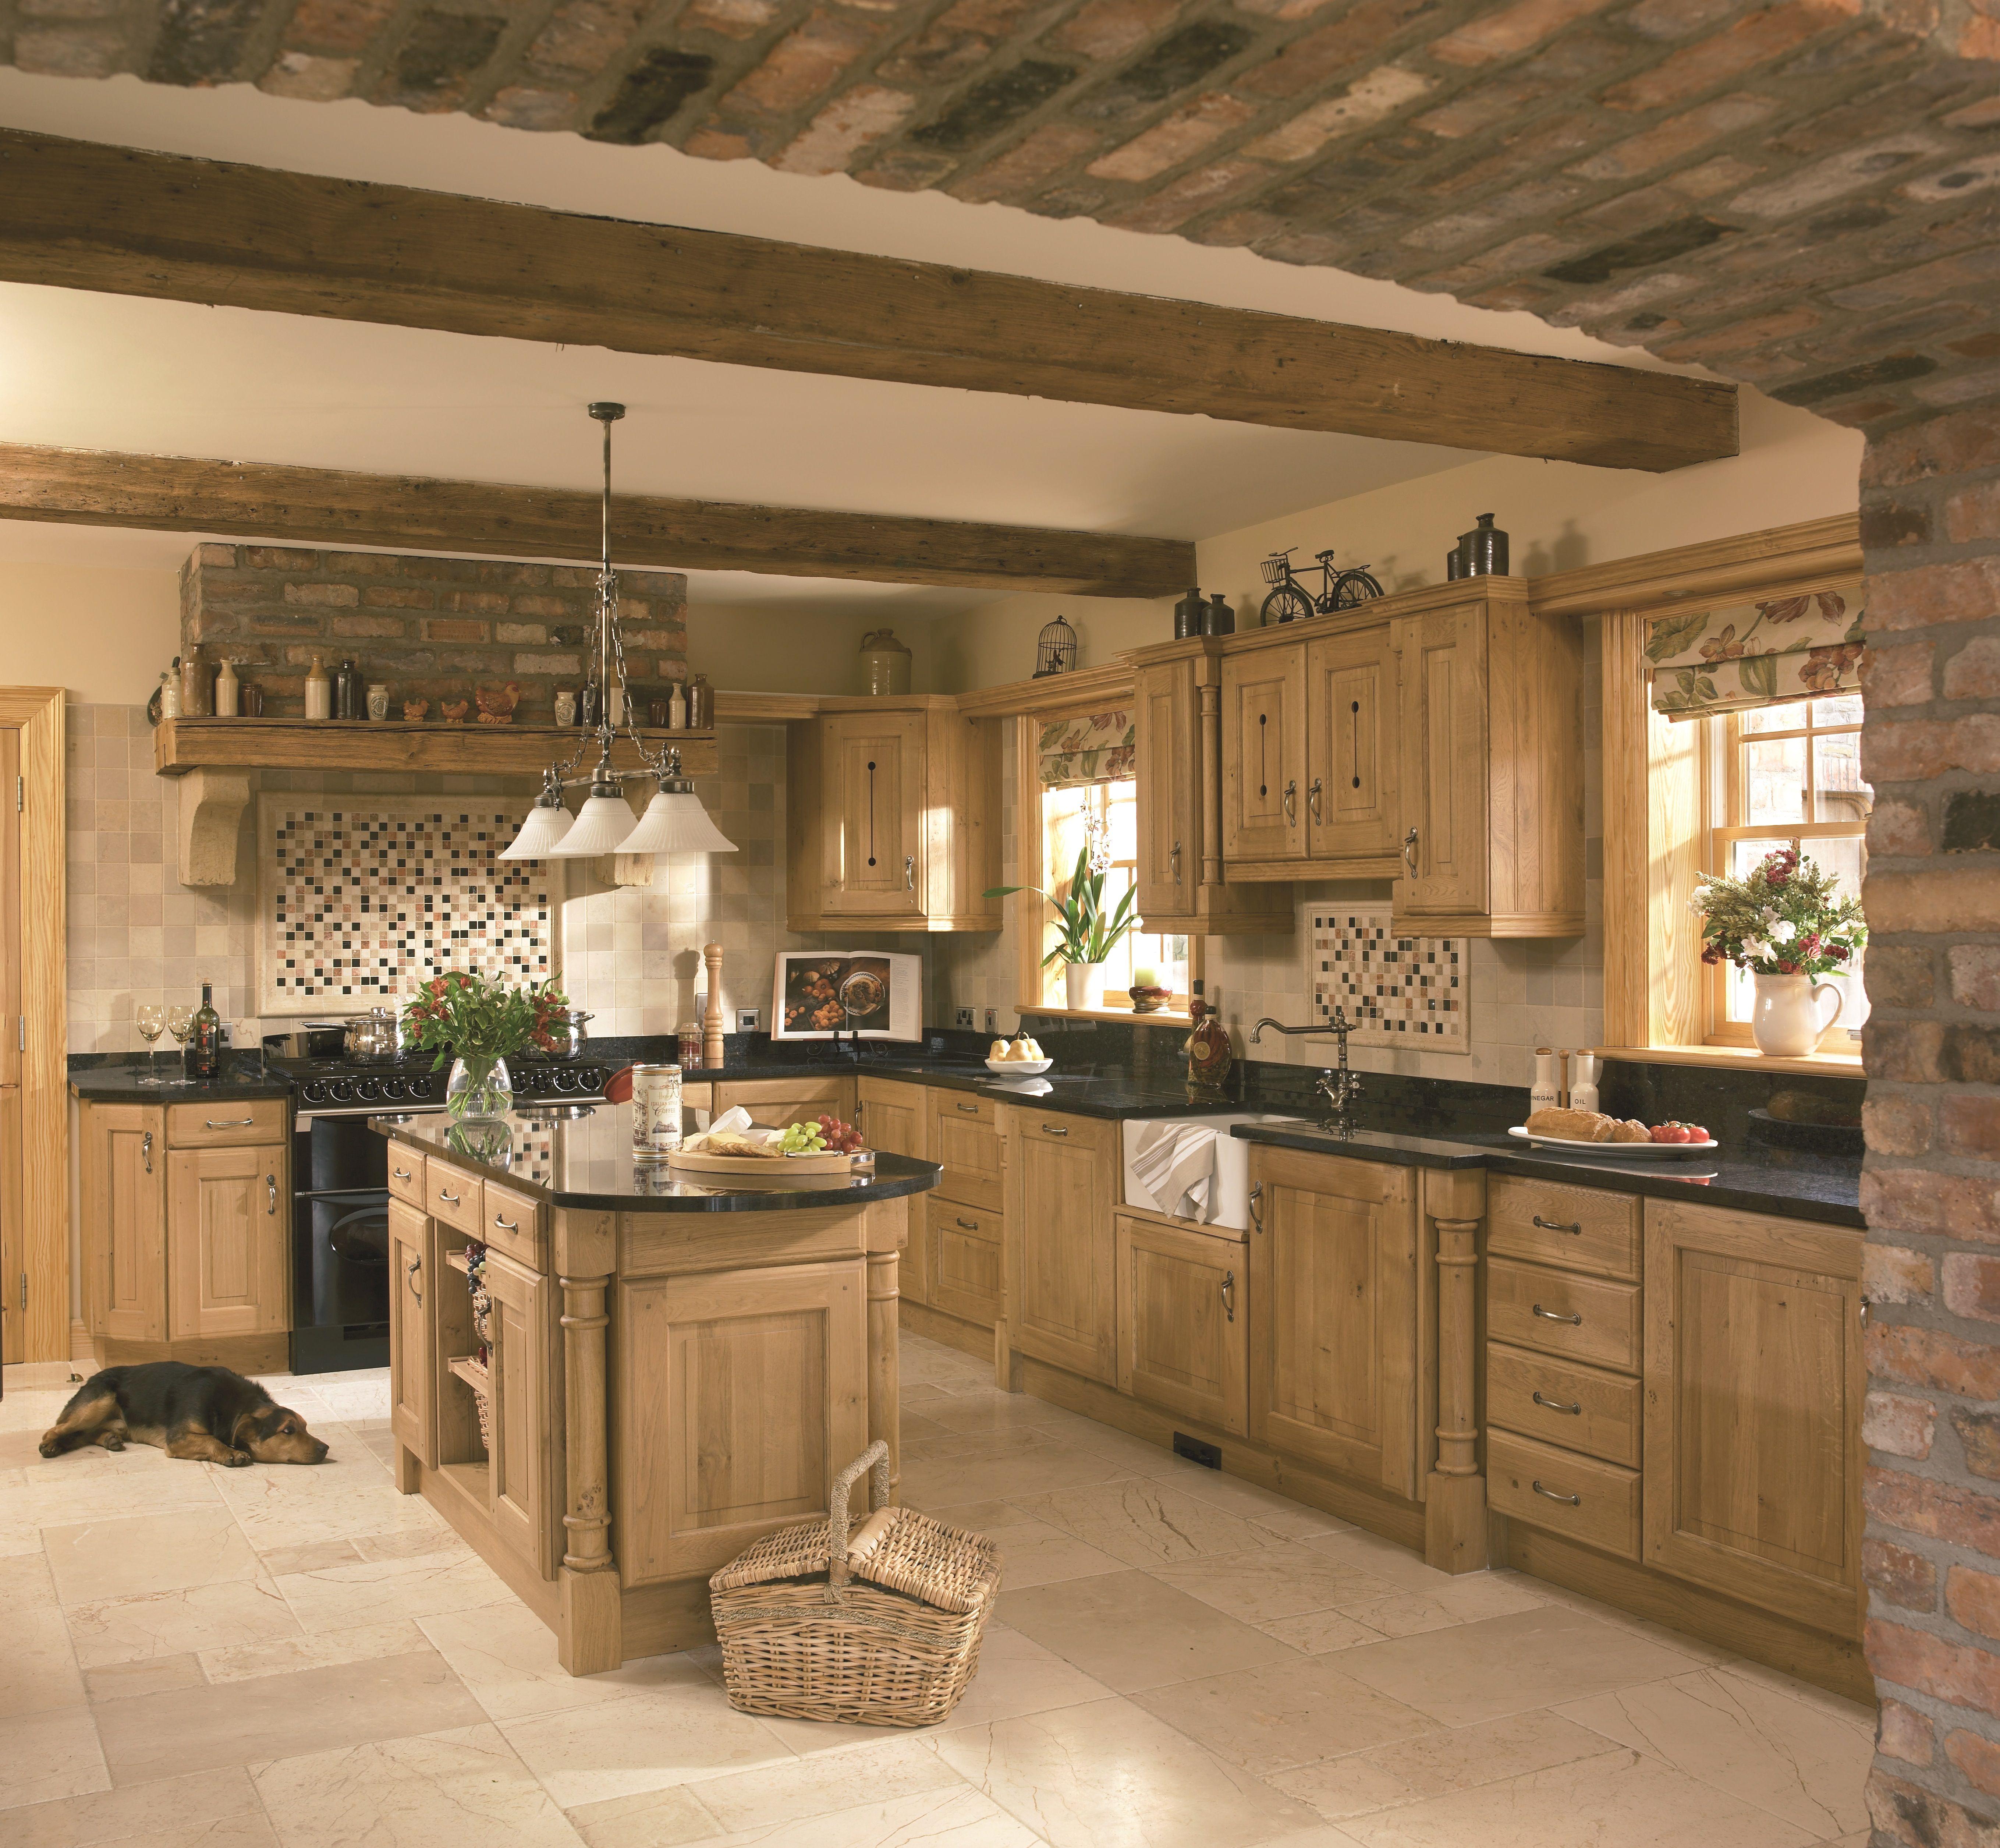 Kitchen Pippy Oak Country Kitchen Kitchen Remodel Kitchen Design